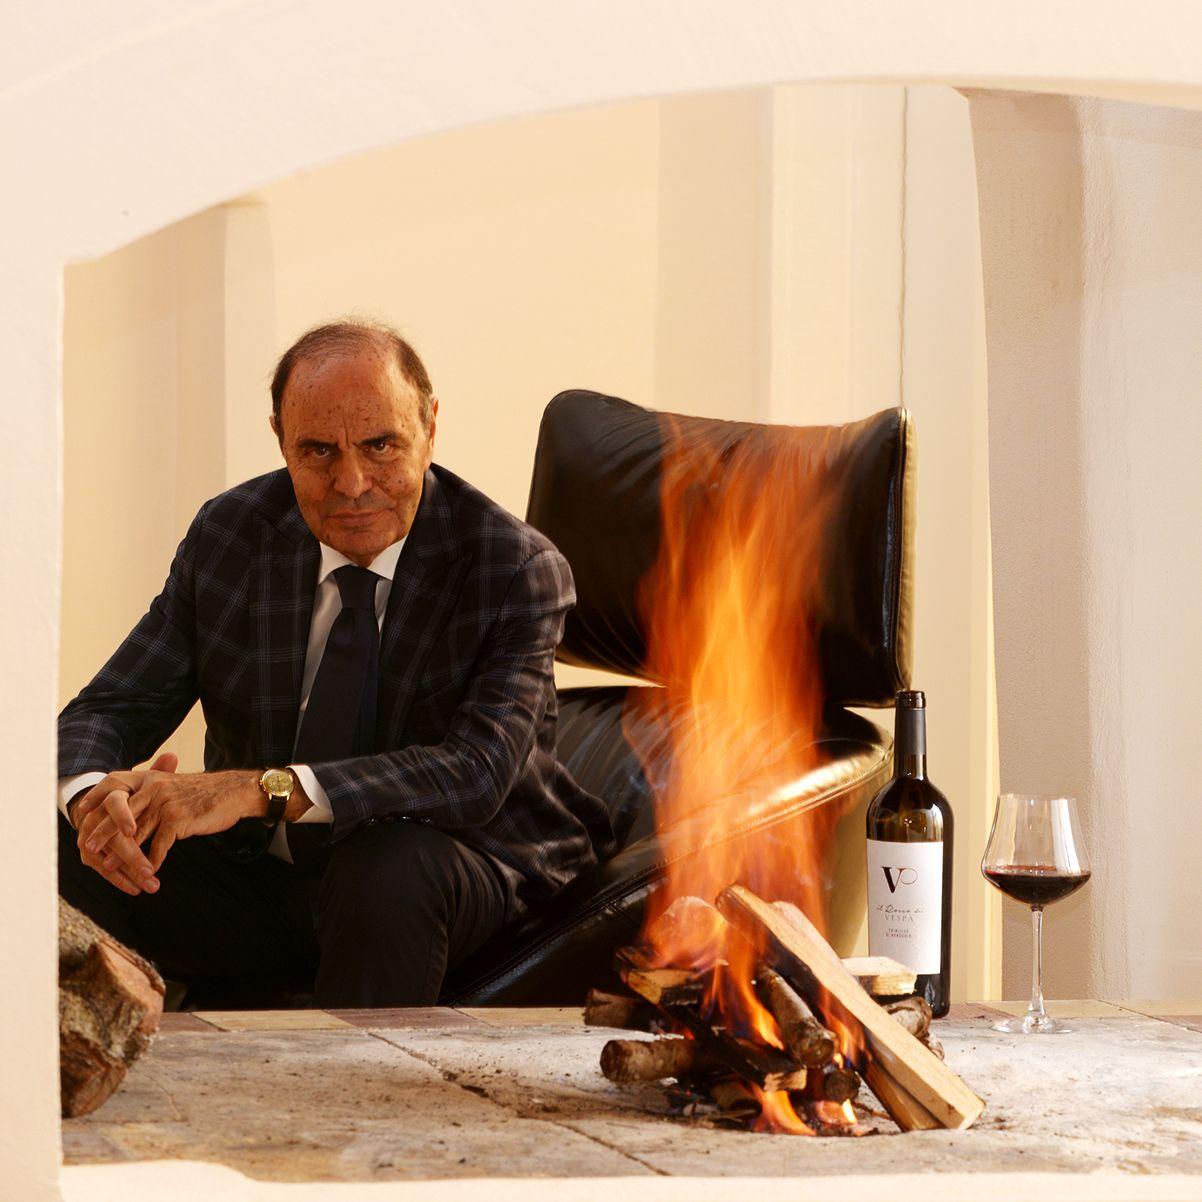 Bruno Vespa Masseria Li Reni Reni Vespa Winery